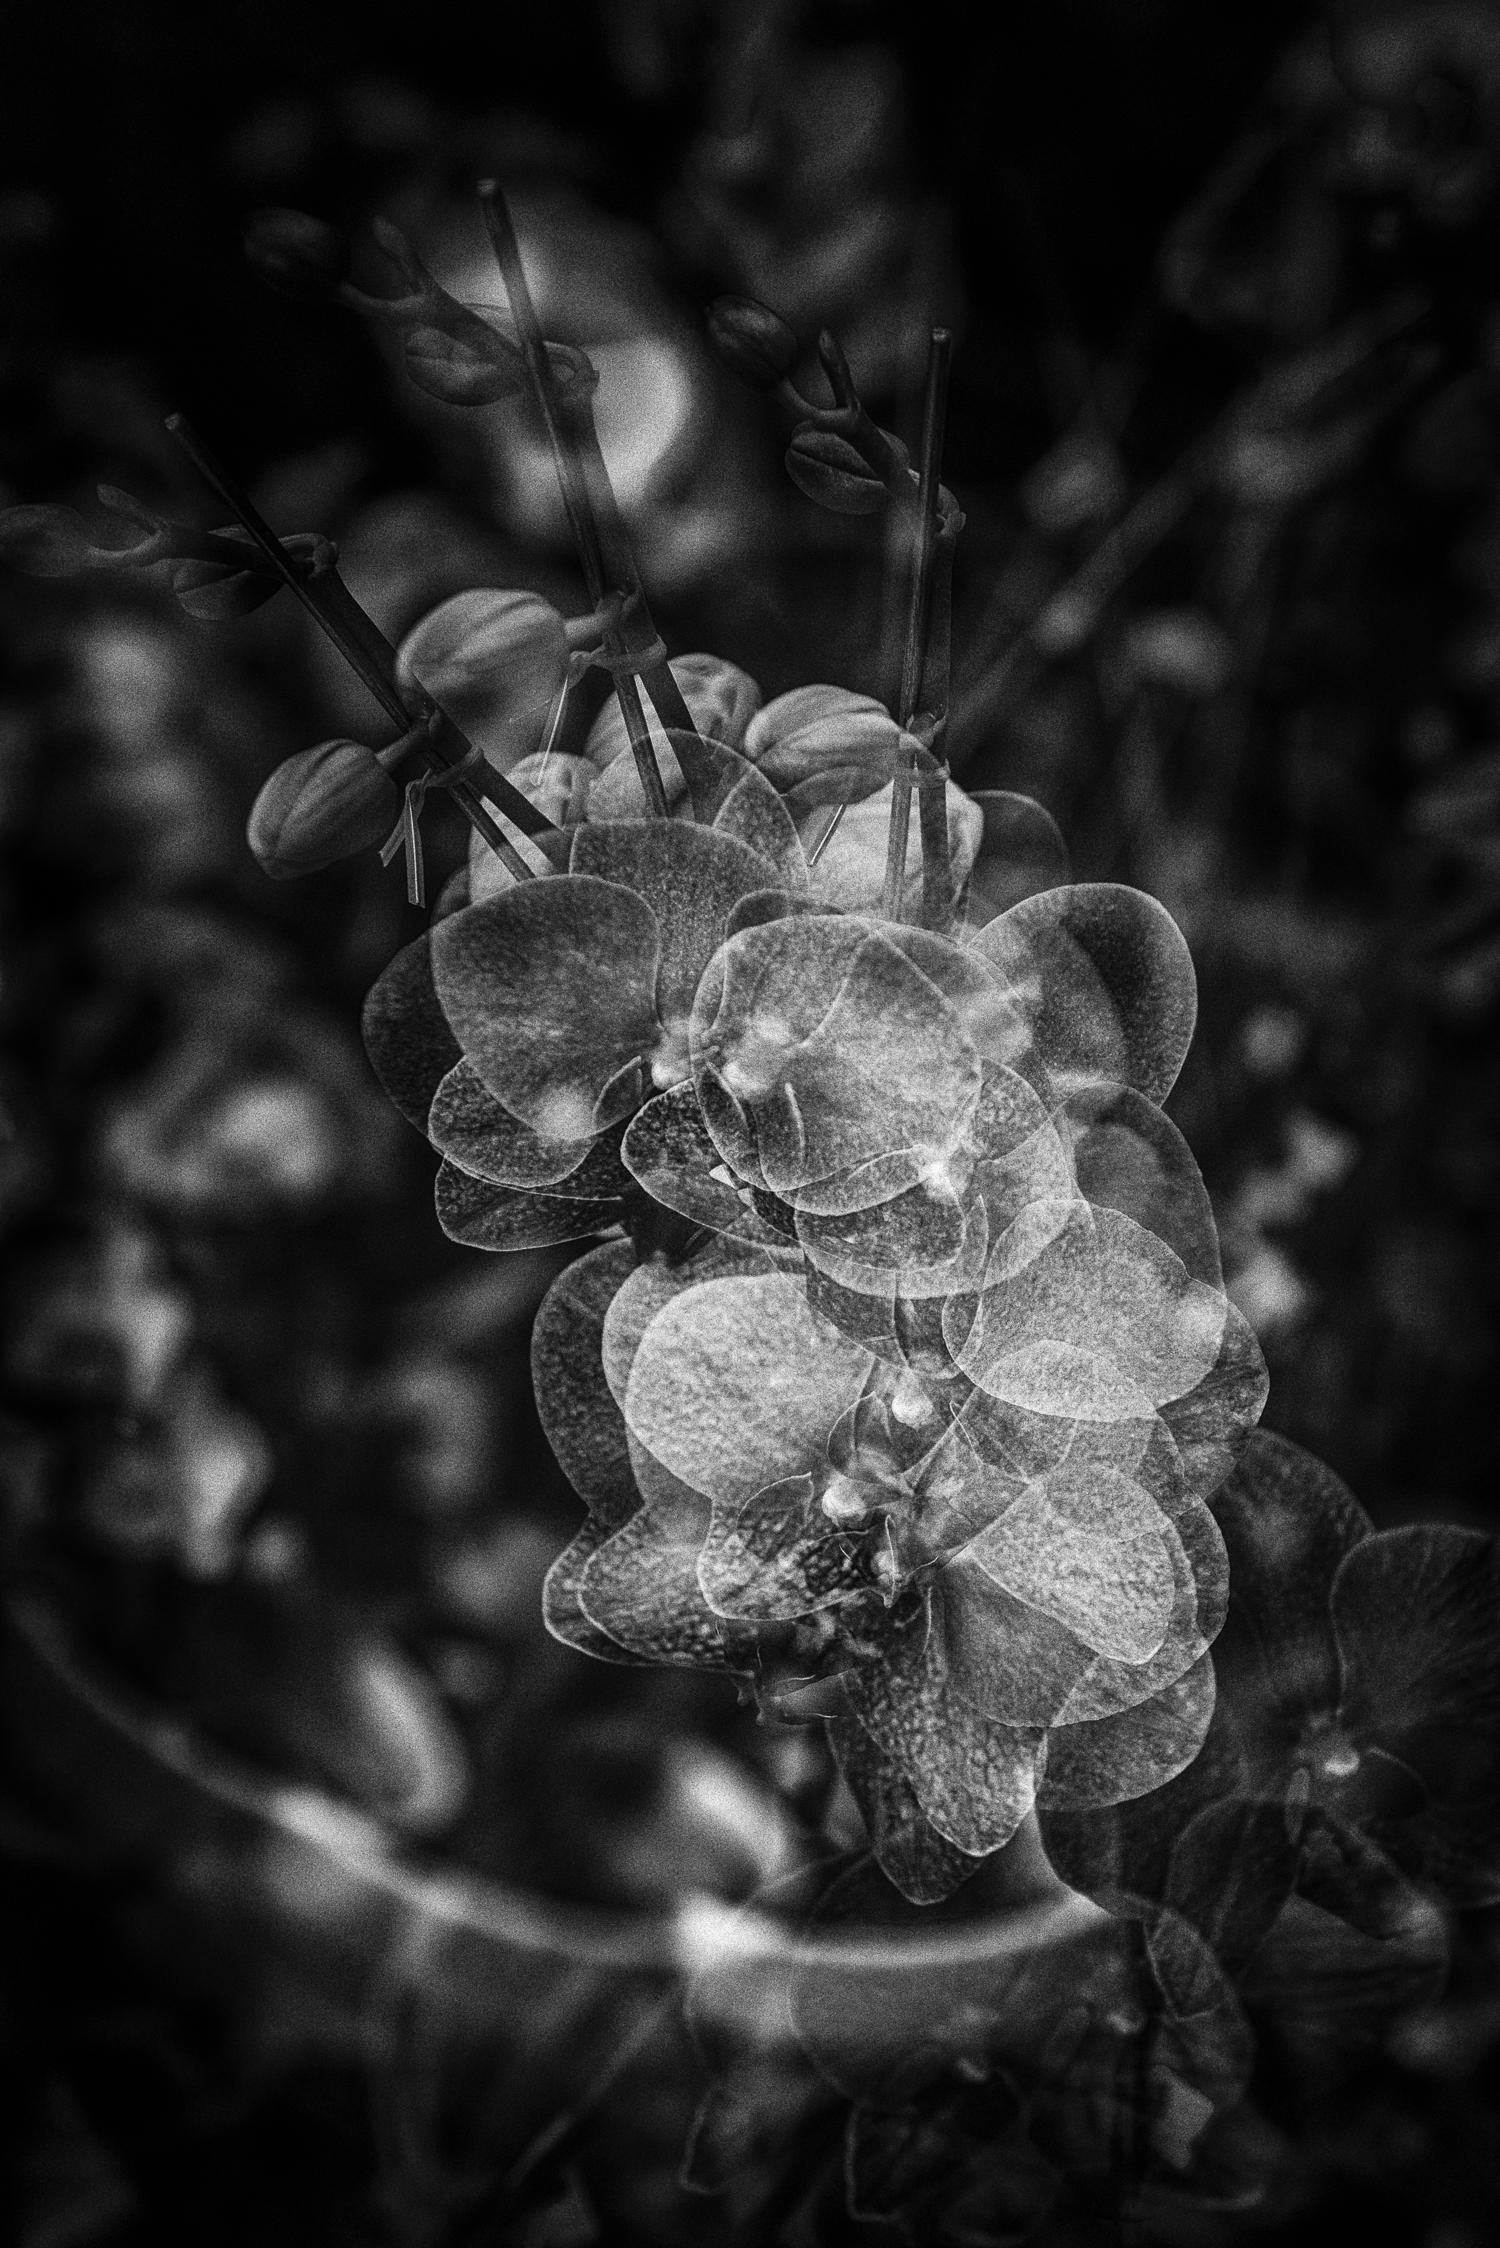 Flowers-_LGF8348-Edit.jpg